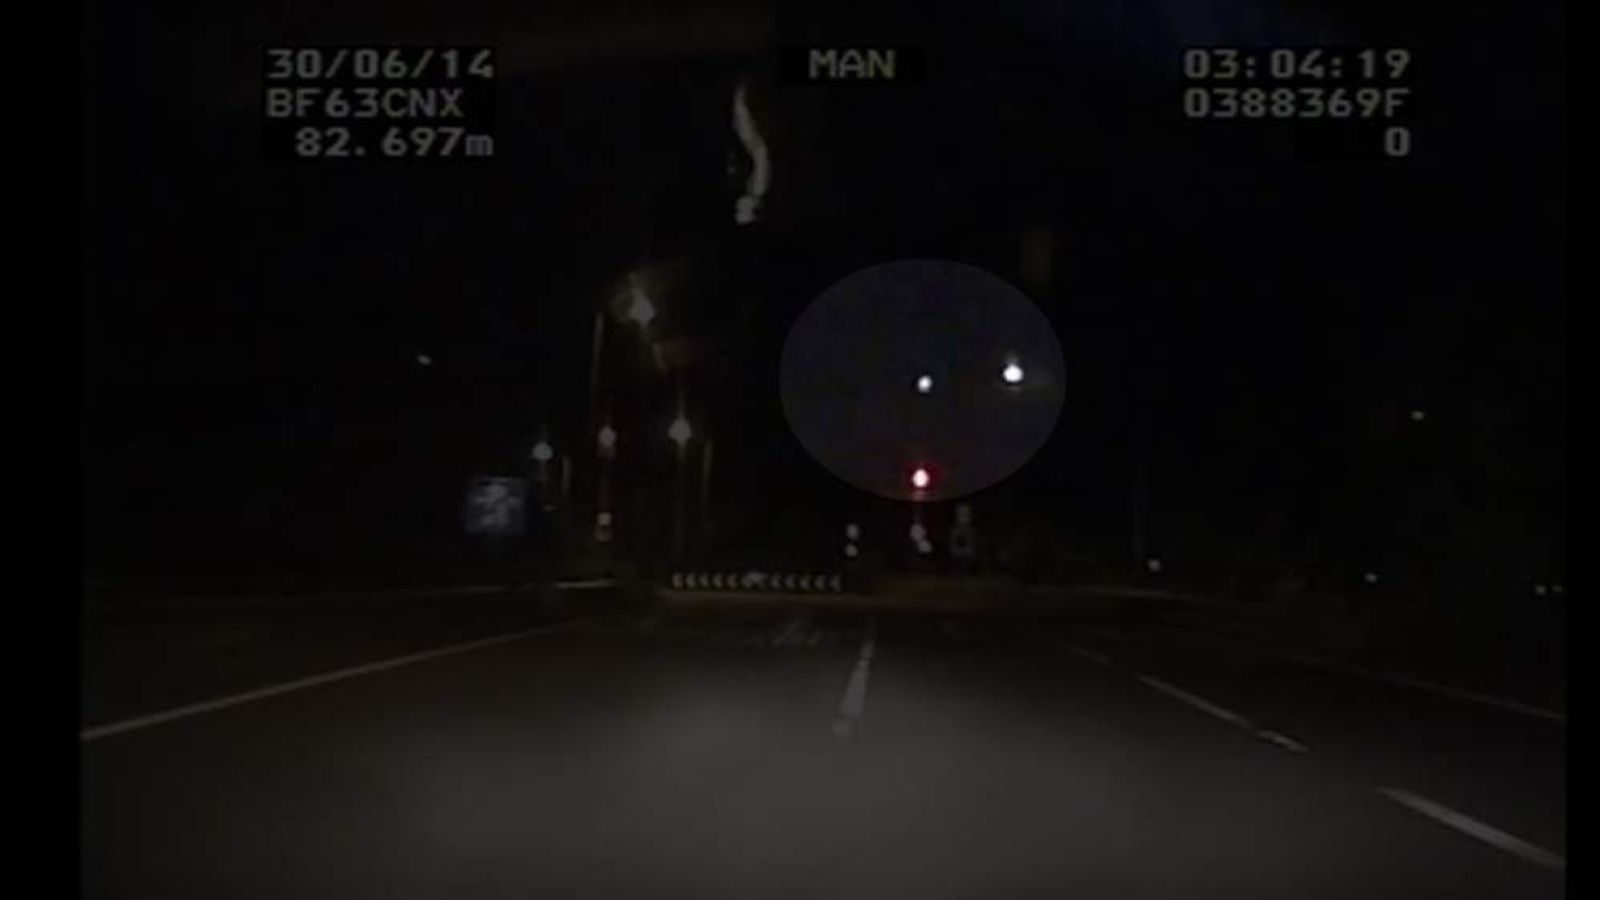 A West Midlands Police car's dash-cam films a meteor